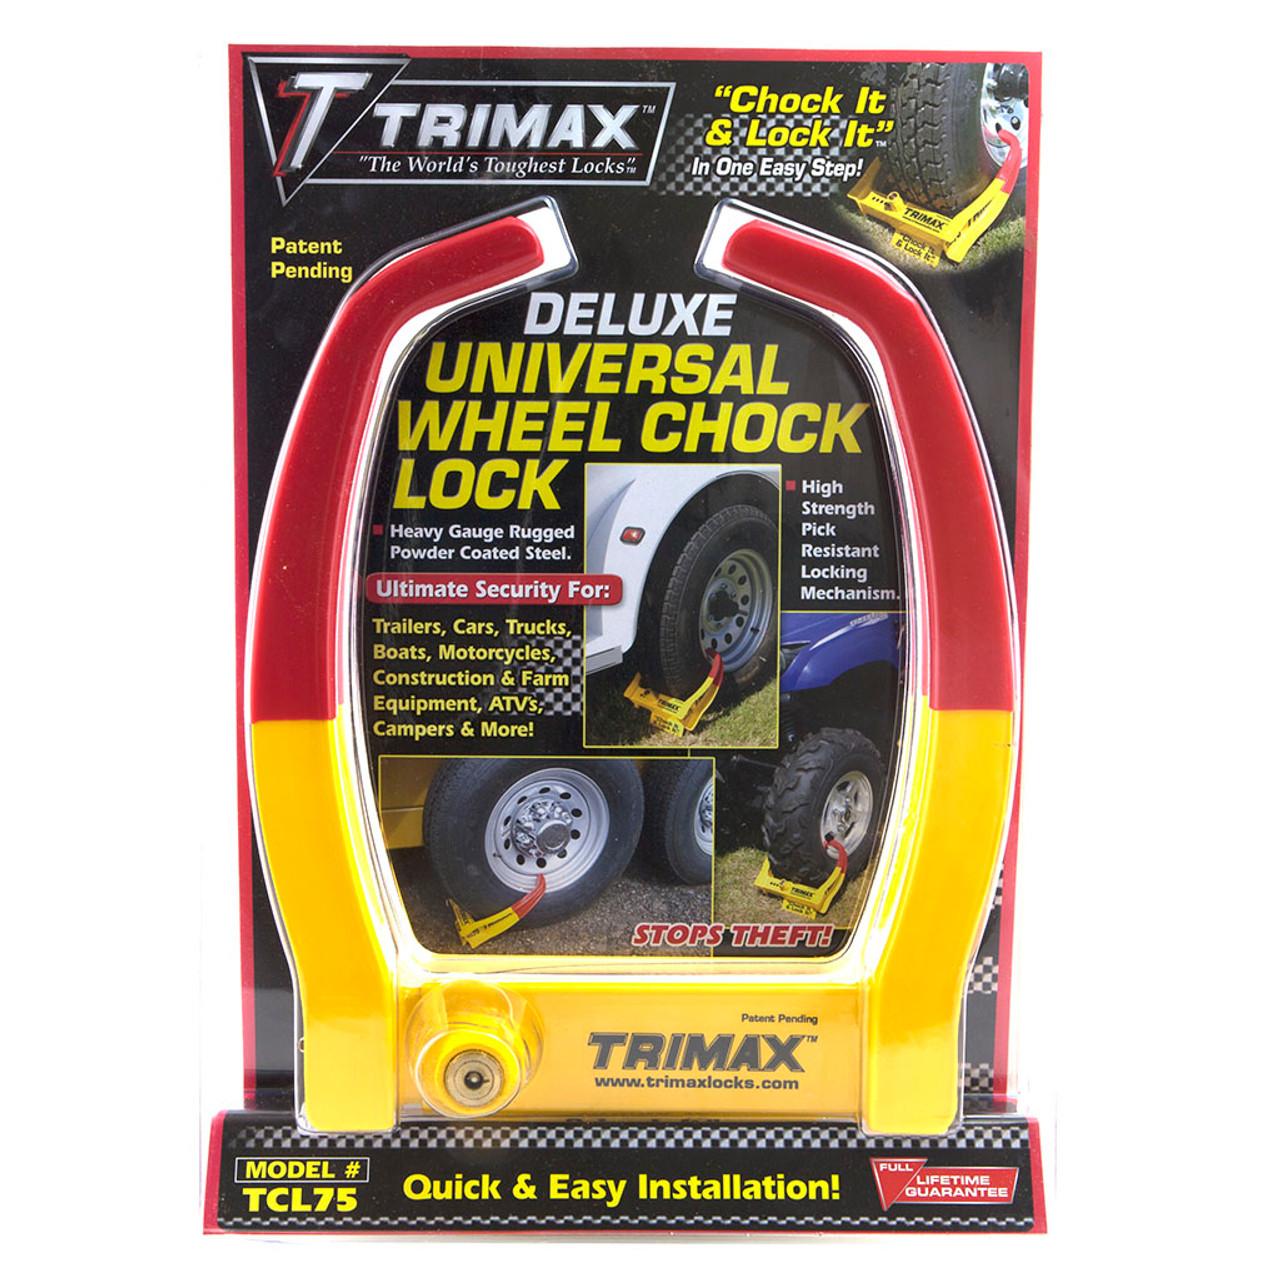 Universal Wheel Chock Lock